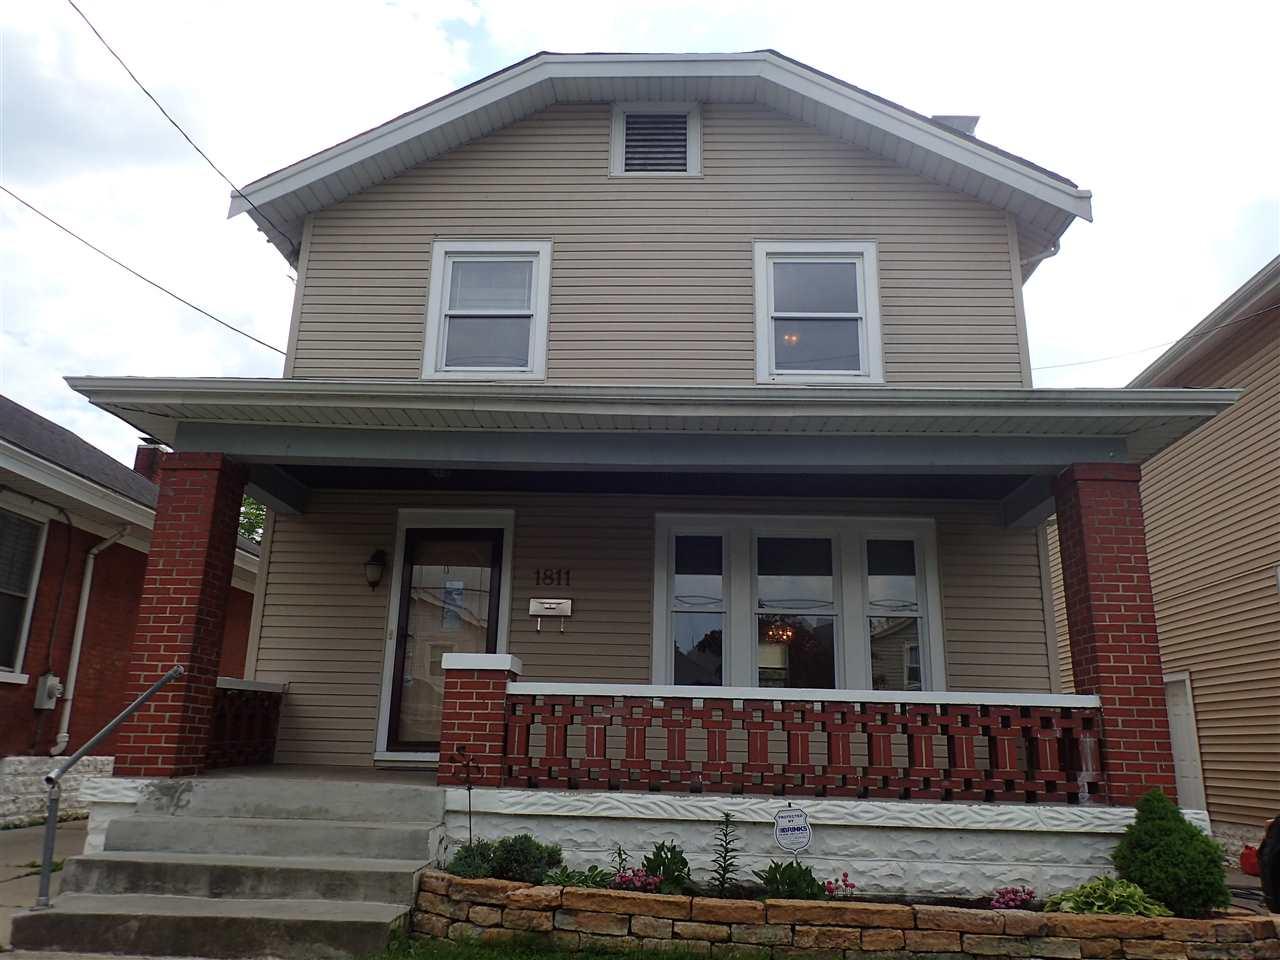 1811 Euclid Avenue, Covington, Kentucky